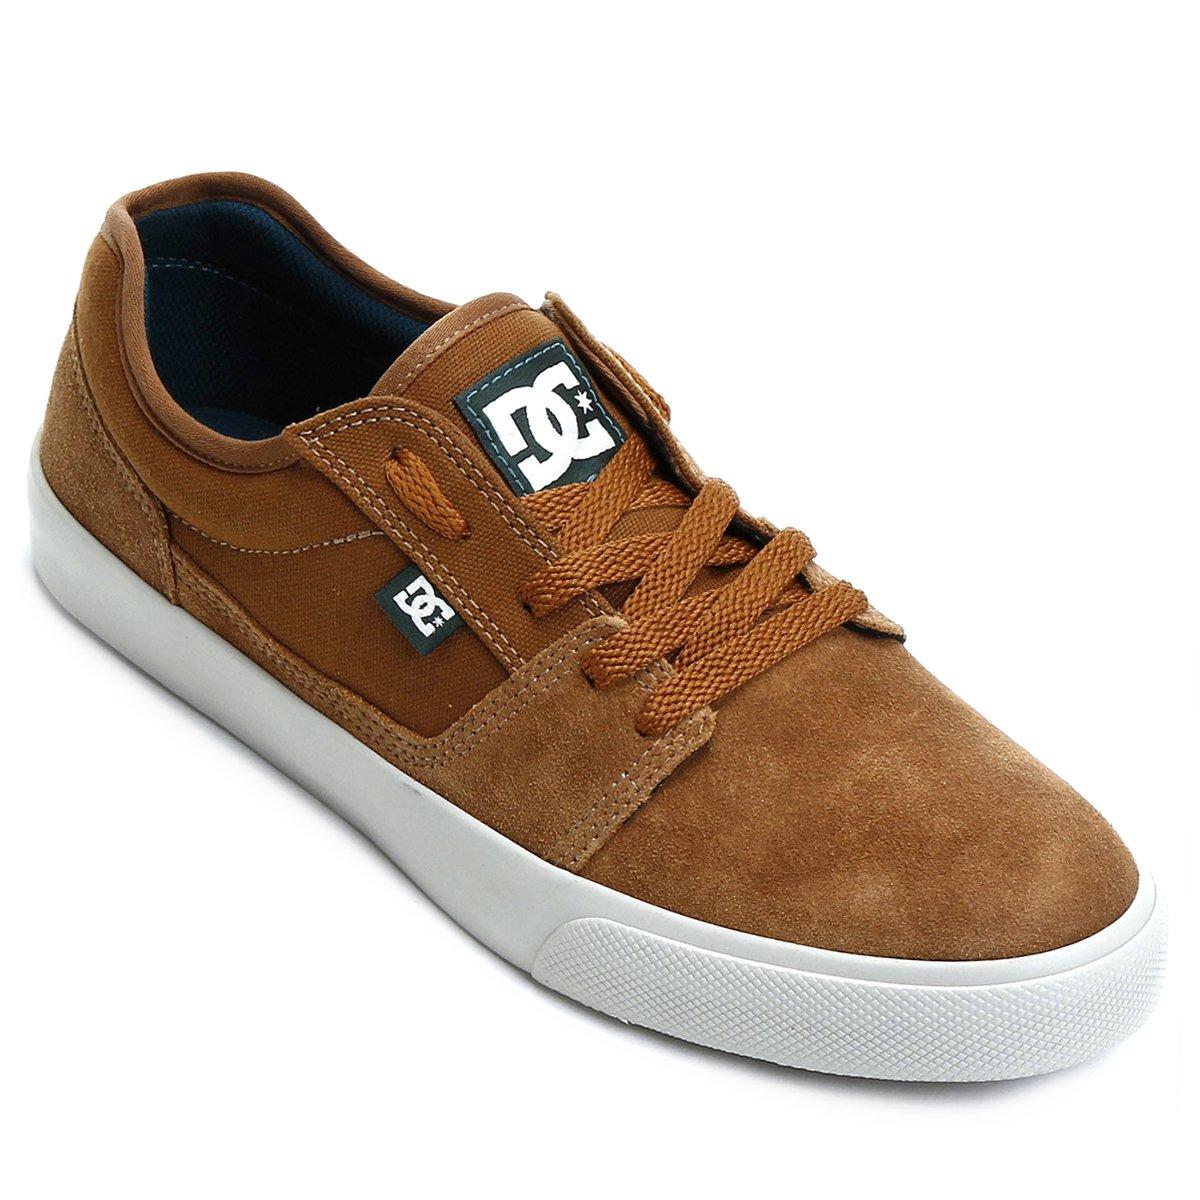 Tênis DC Shoes Tonik - Compre Agora  c92ac4780cb60